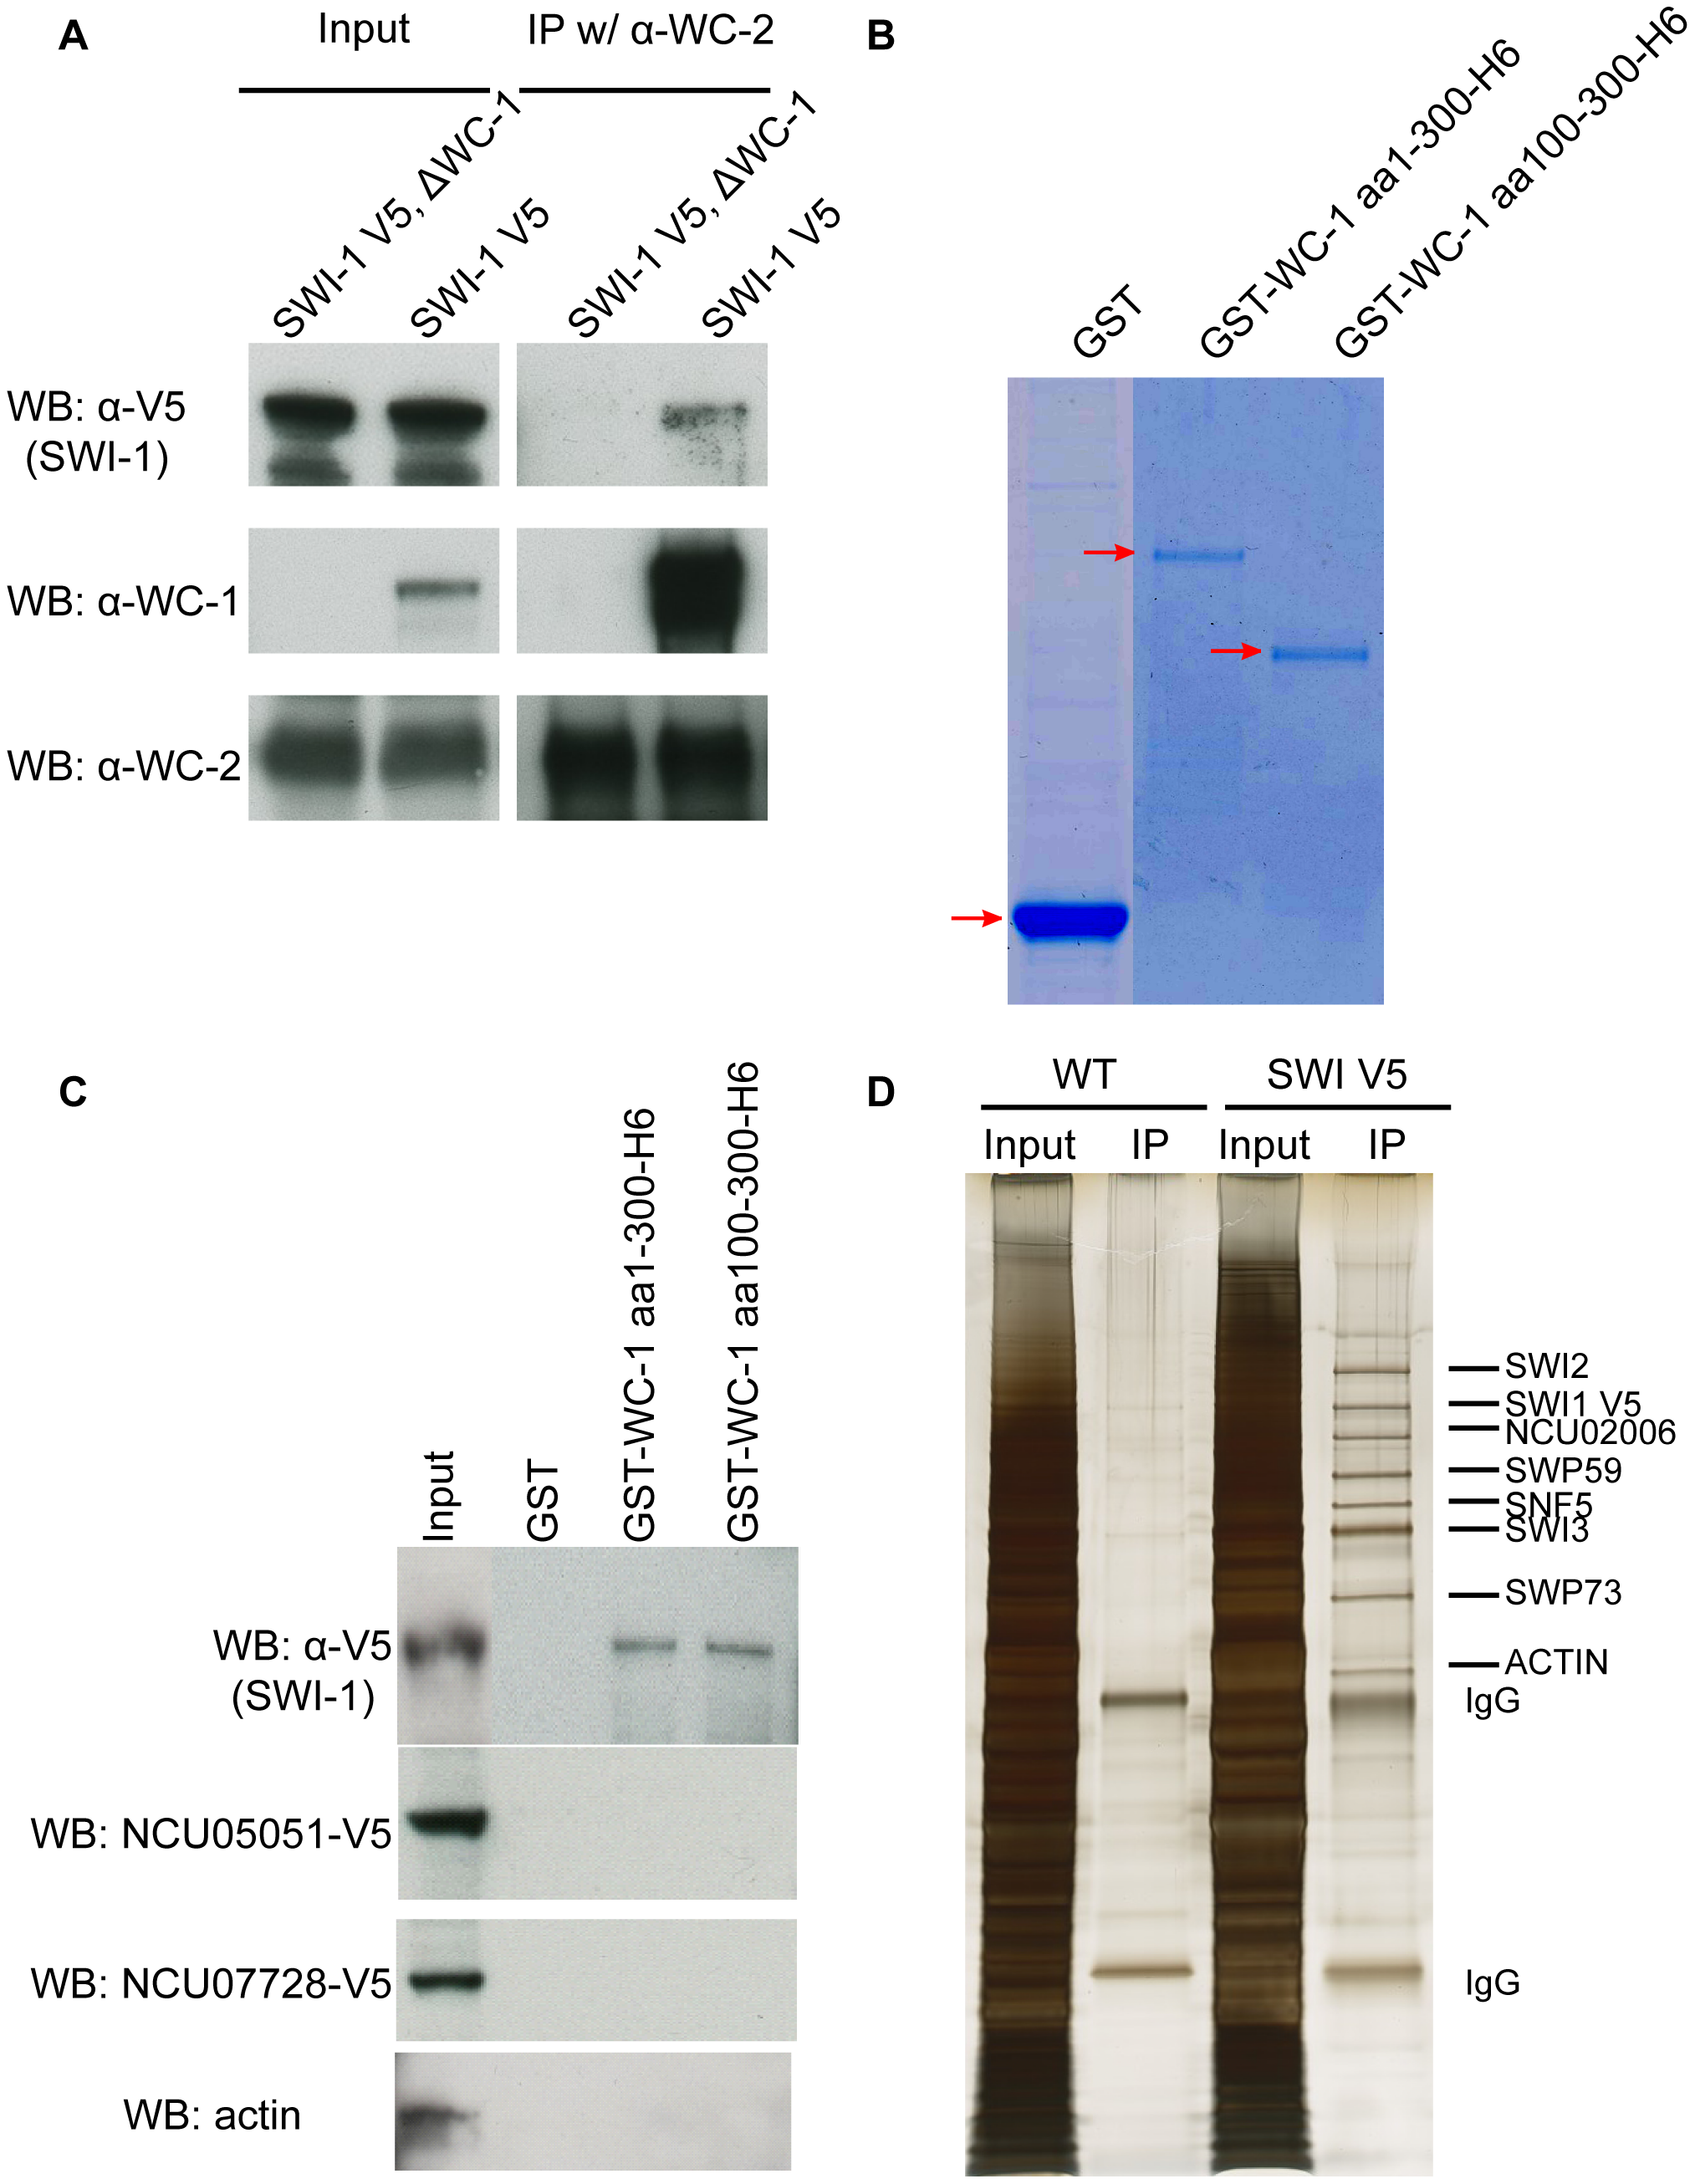 WCC interacts with SWI/SNF <i>in vivo</i> and <i>in vitro</i>.